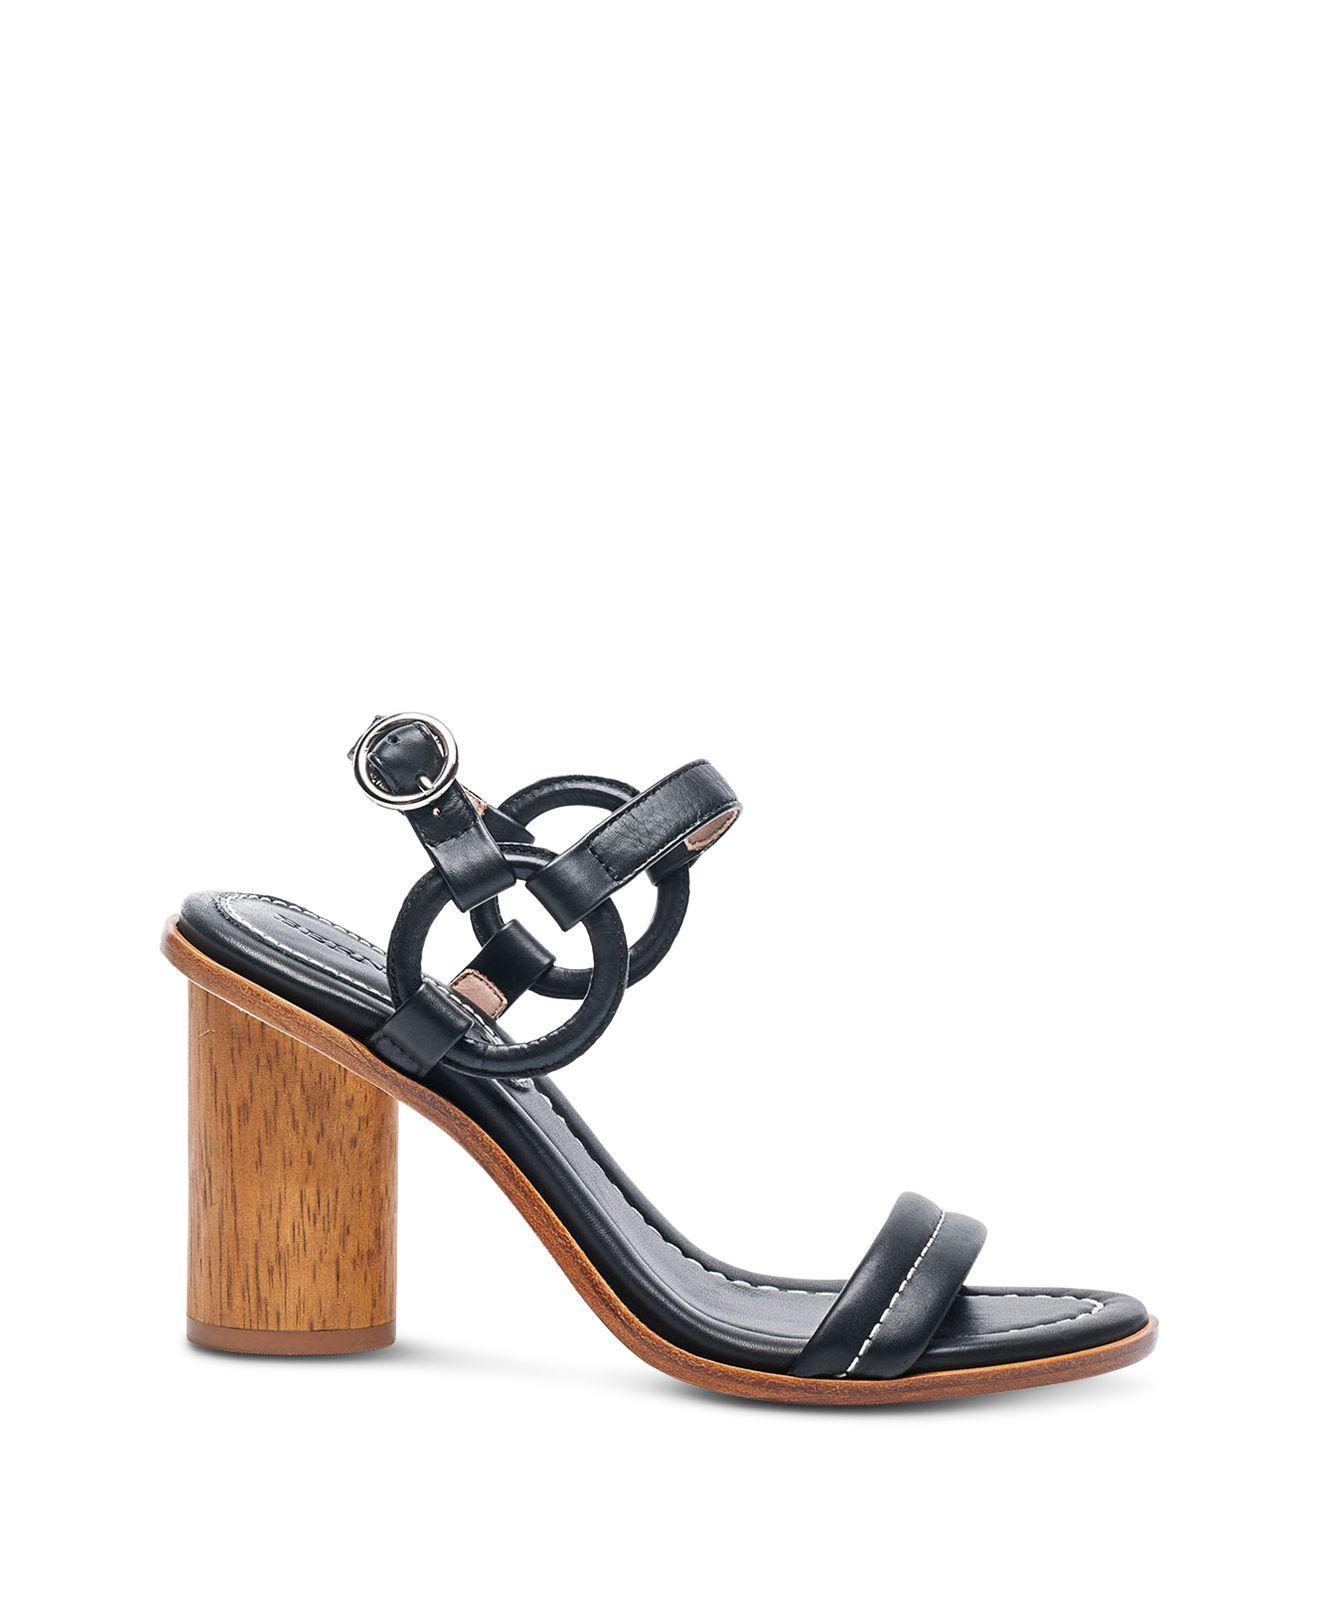 Bernardo Women's Leather Circle Strap Block Heel Sandals UdbLrbWEu